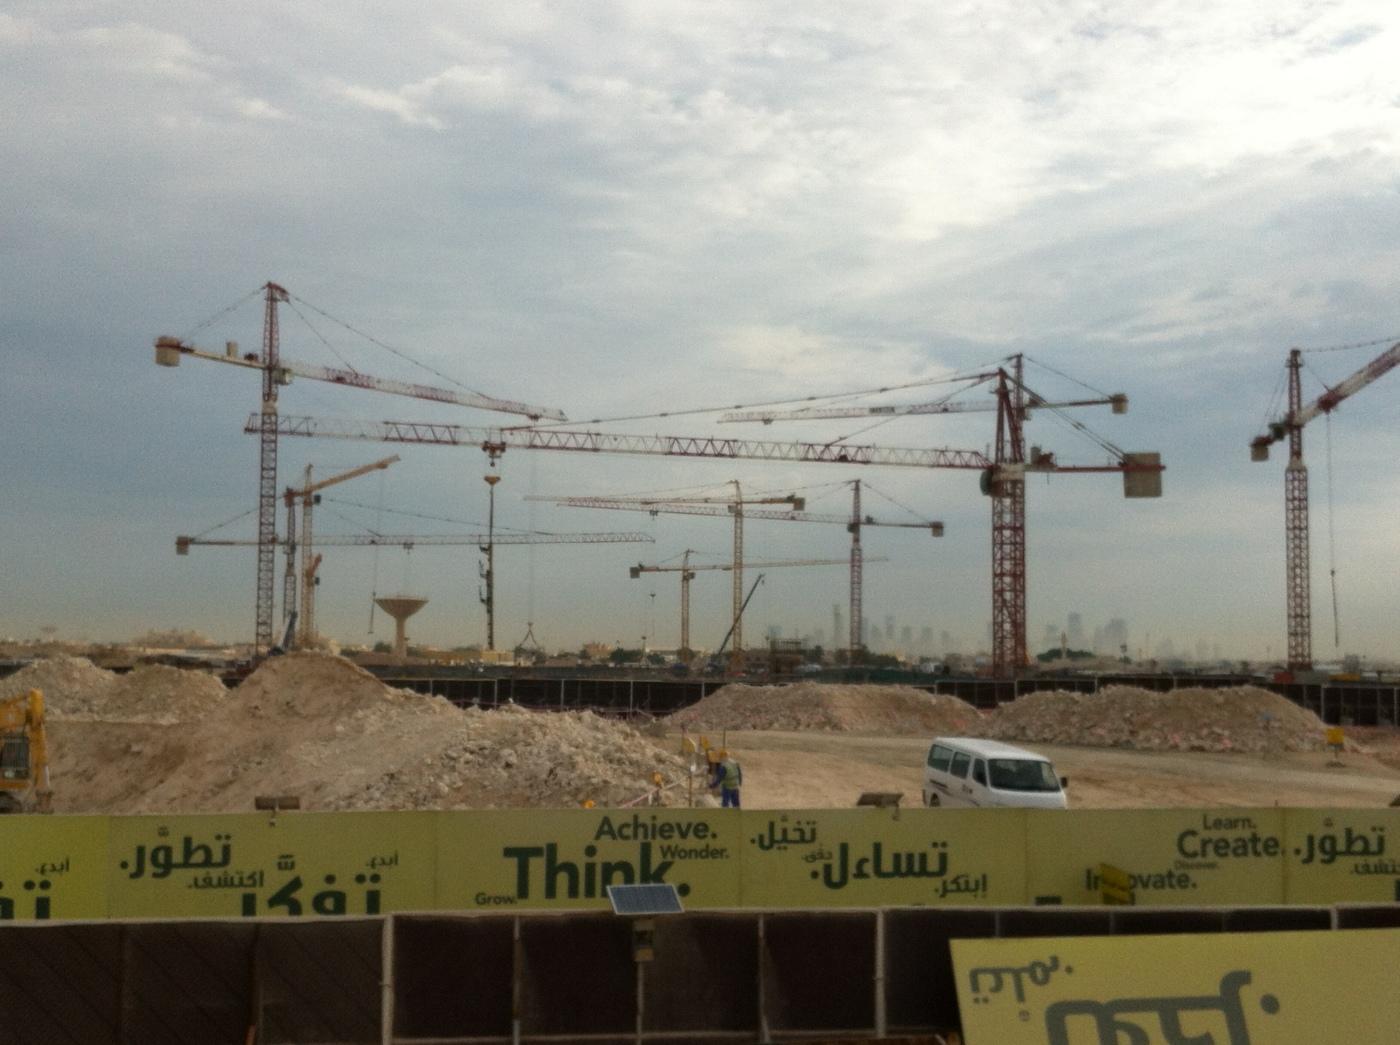 Qatar Job Site